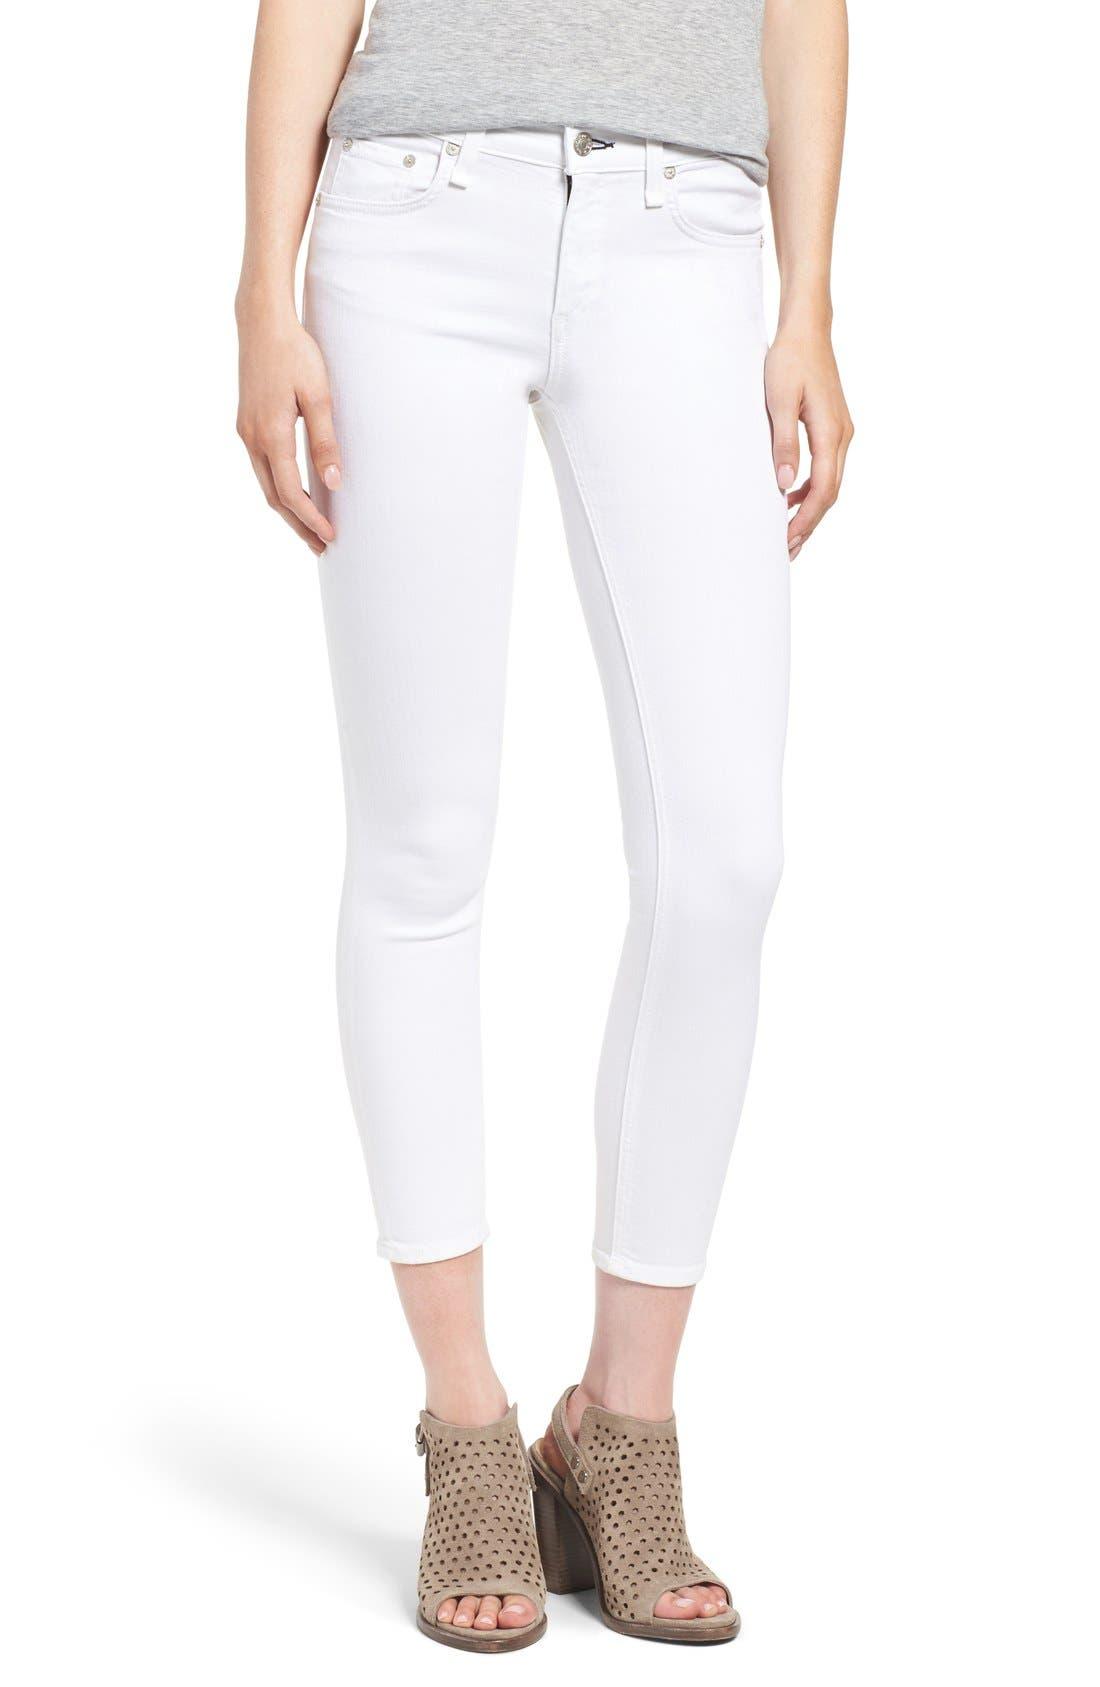 Alternate Image 1 Selected - rag & bone/JEAN 'Capri' Skinny Crop Jeans (Bright White)